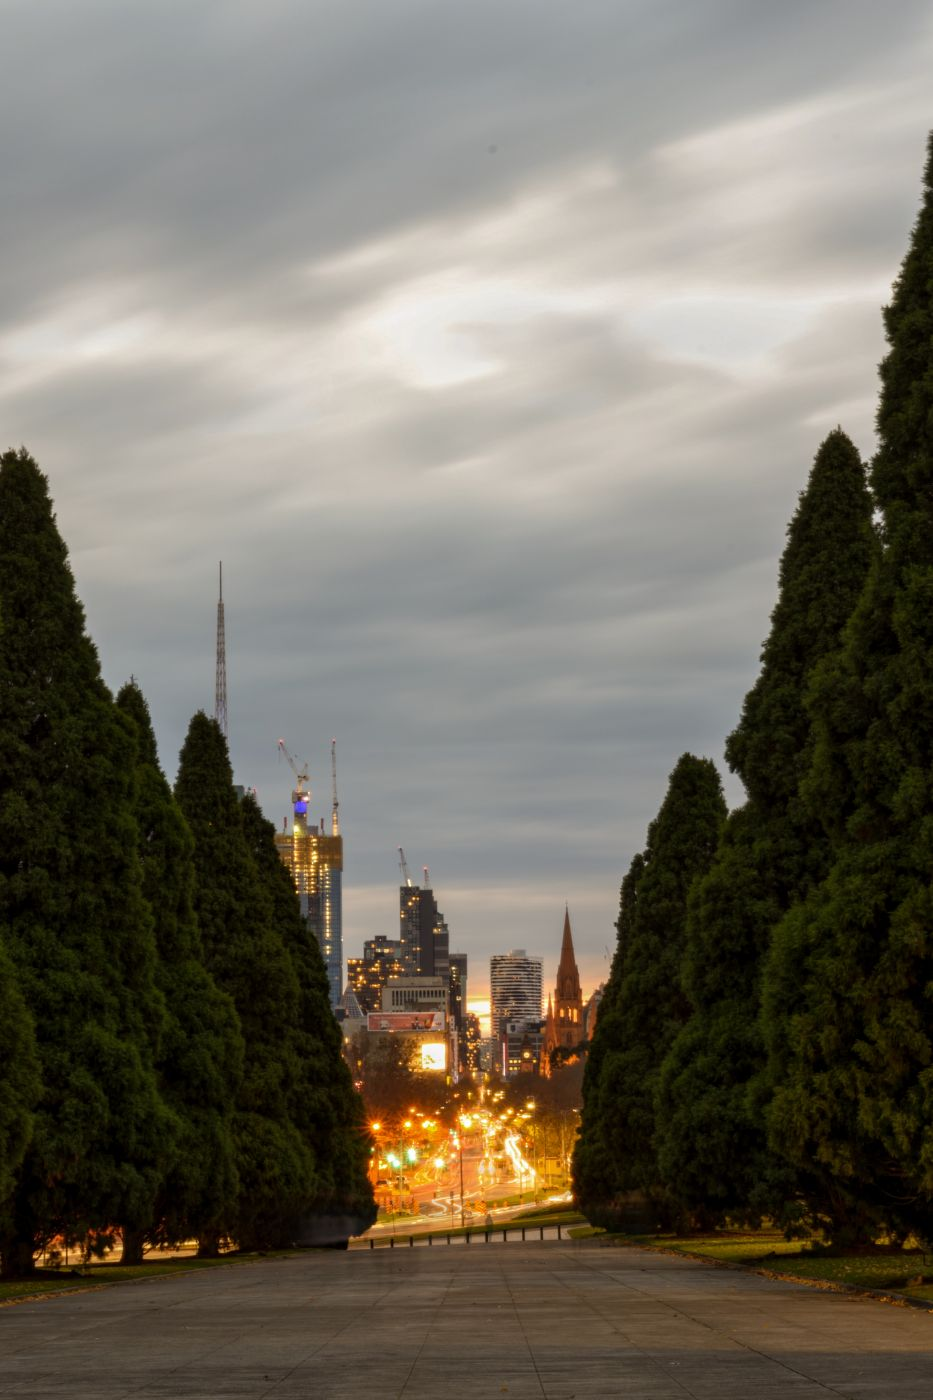 Shrine of Remembrance, Australia